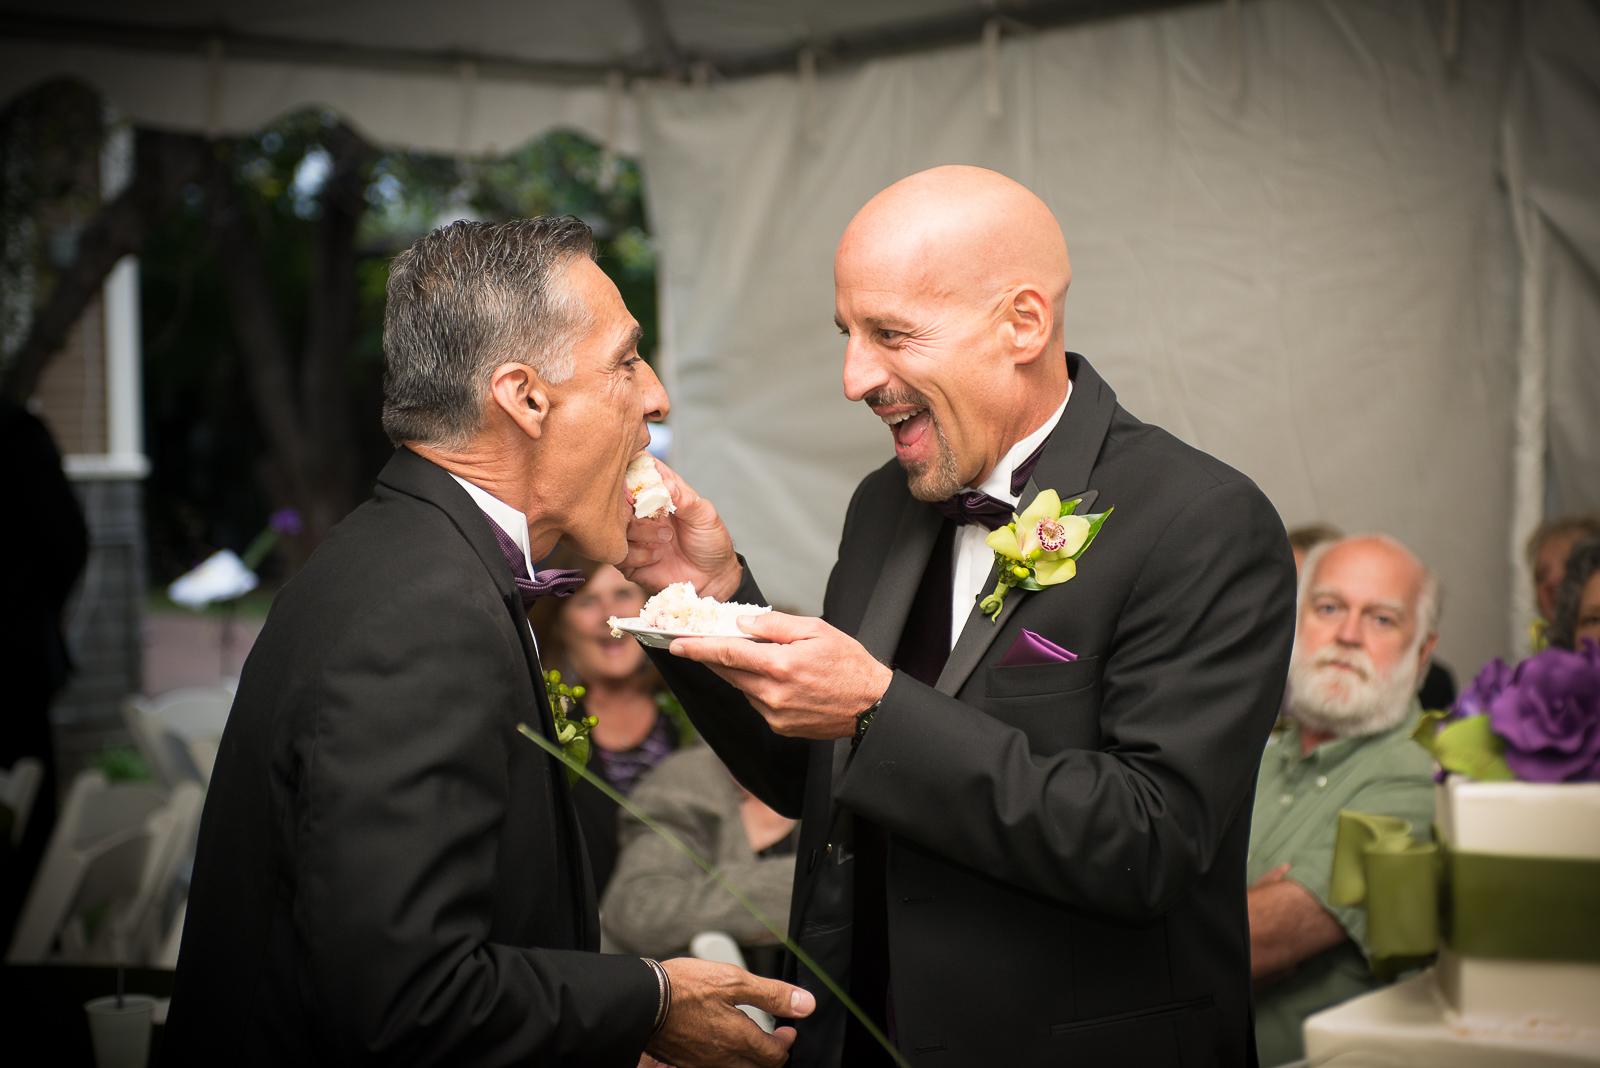 Michael-Napier-Weddings-Ludwig-Guilbeau Wedding-20 (38).jpg